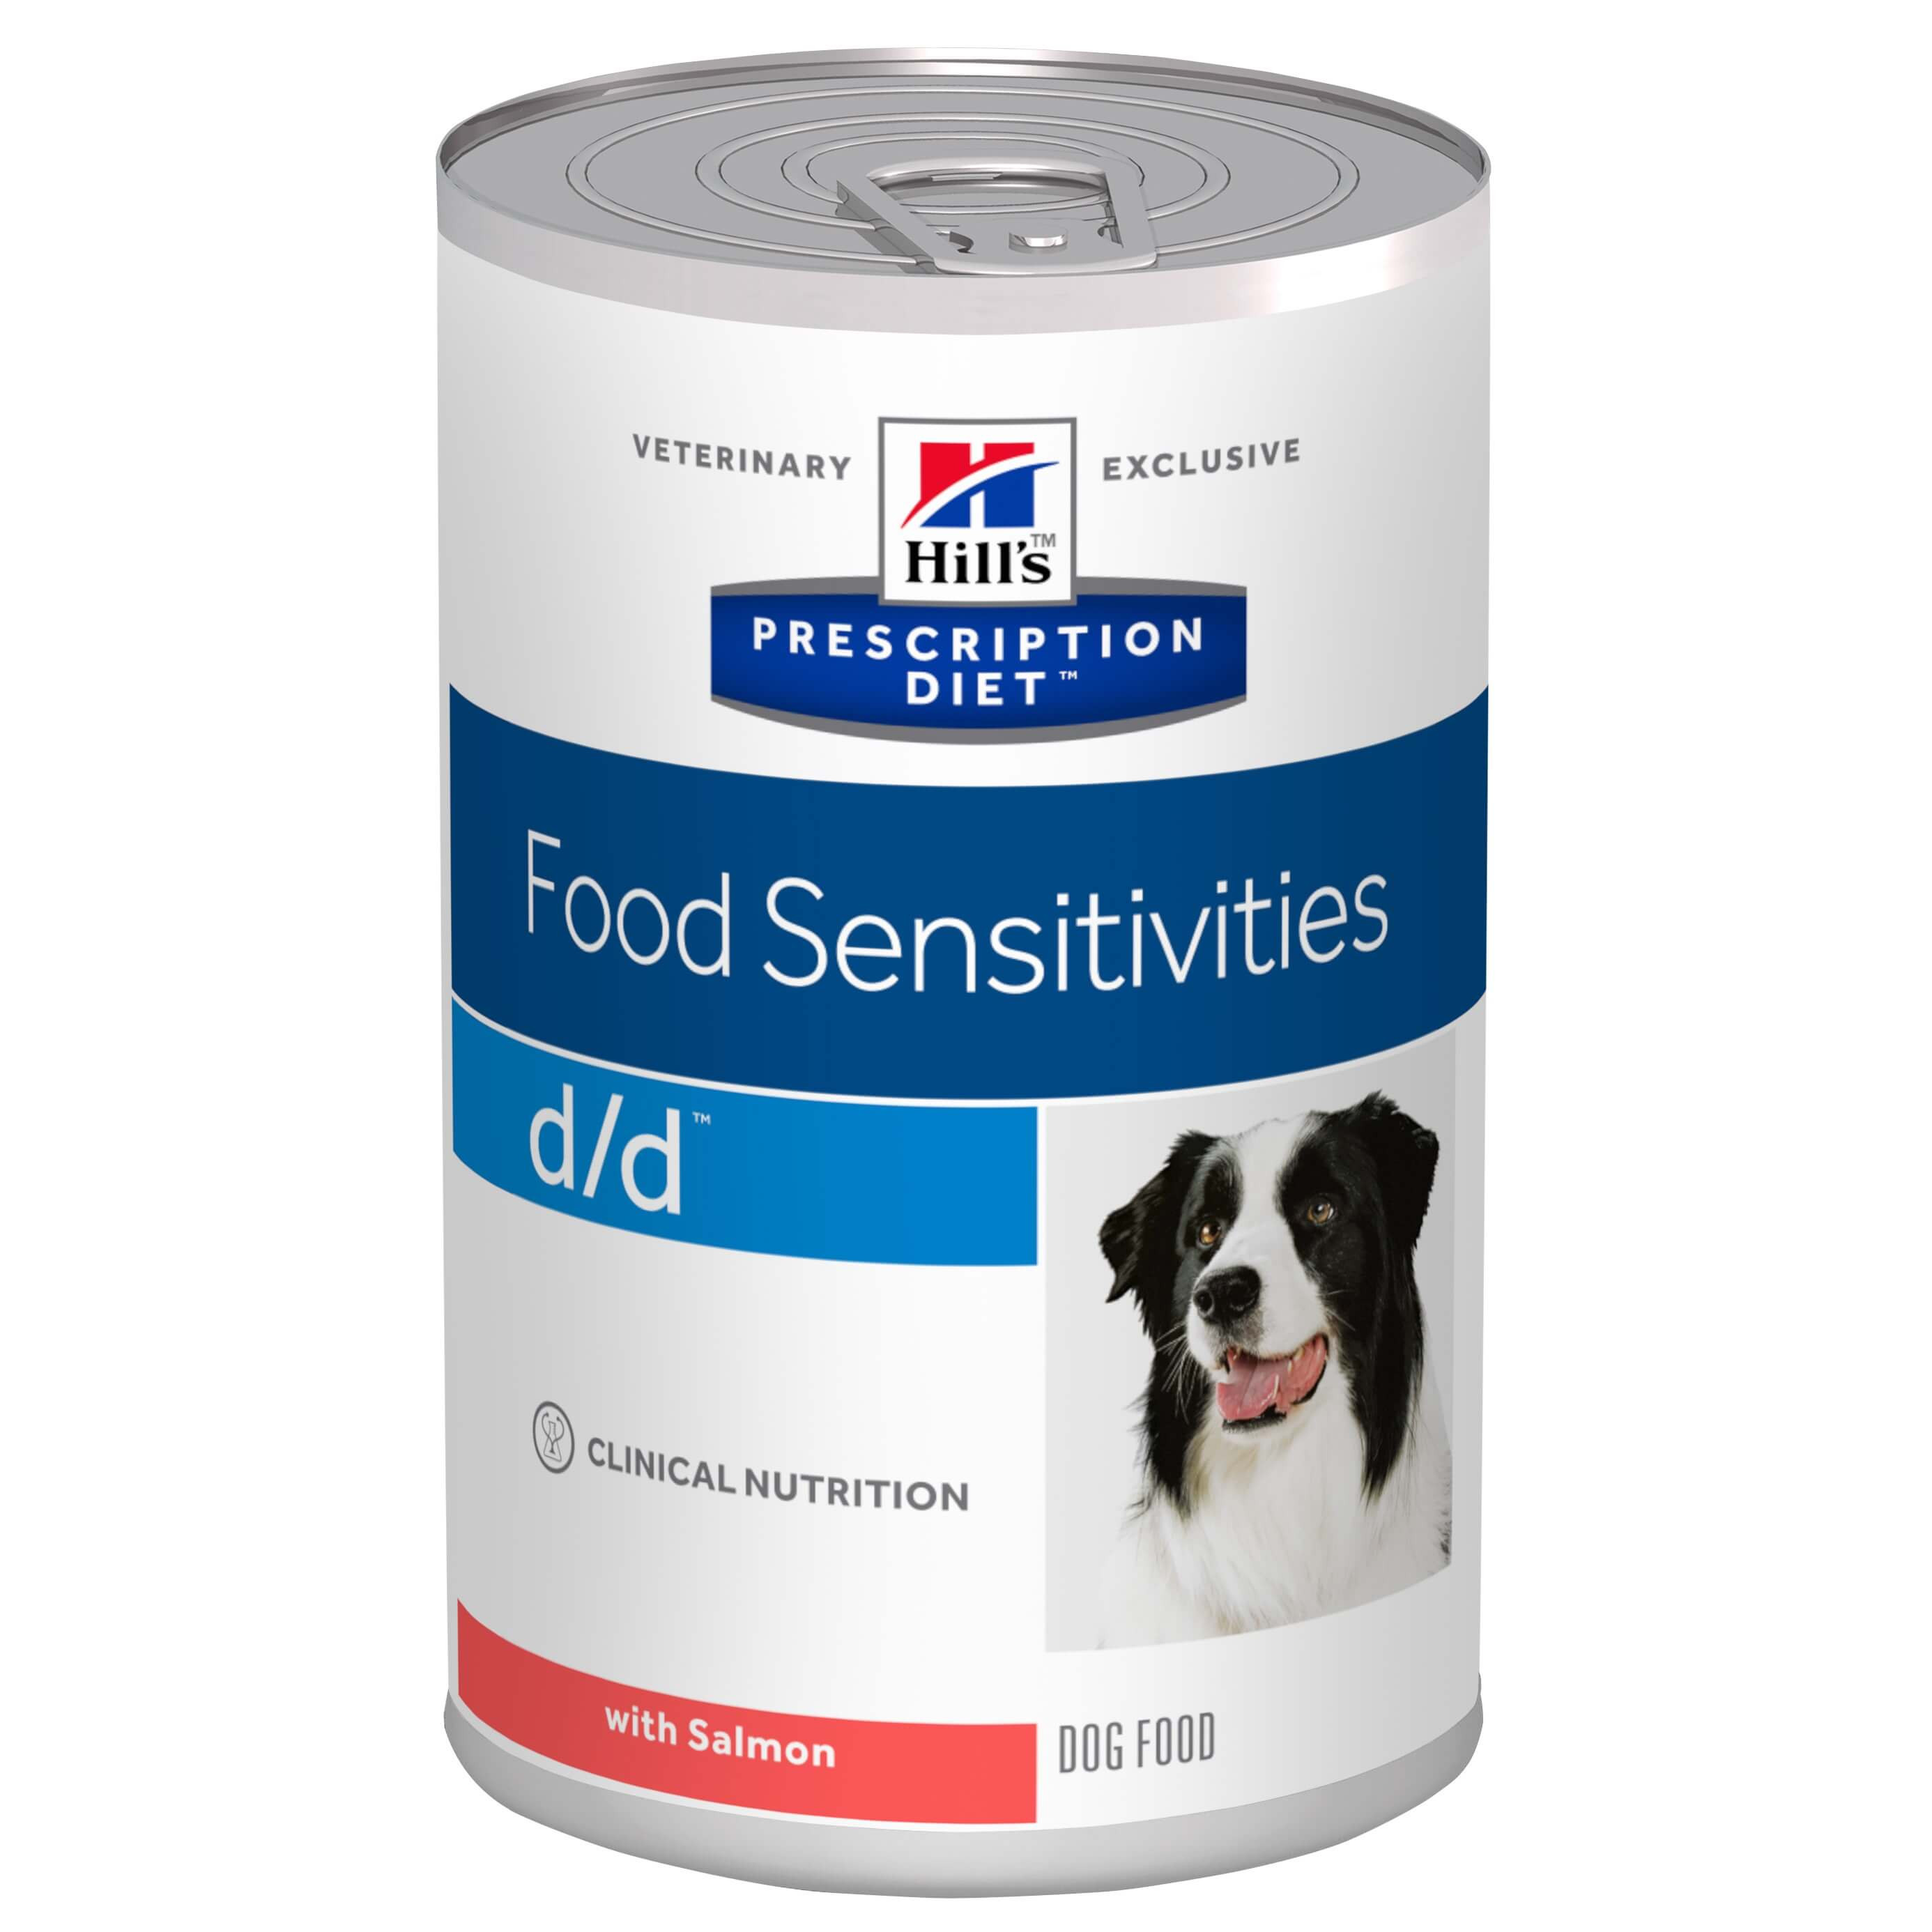 Hill's Prescription Diet D/D Zalm 370 gr blik hondenvoer